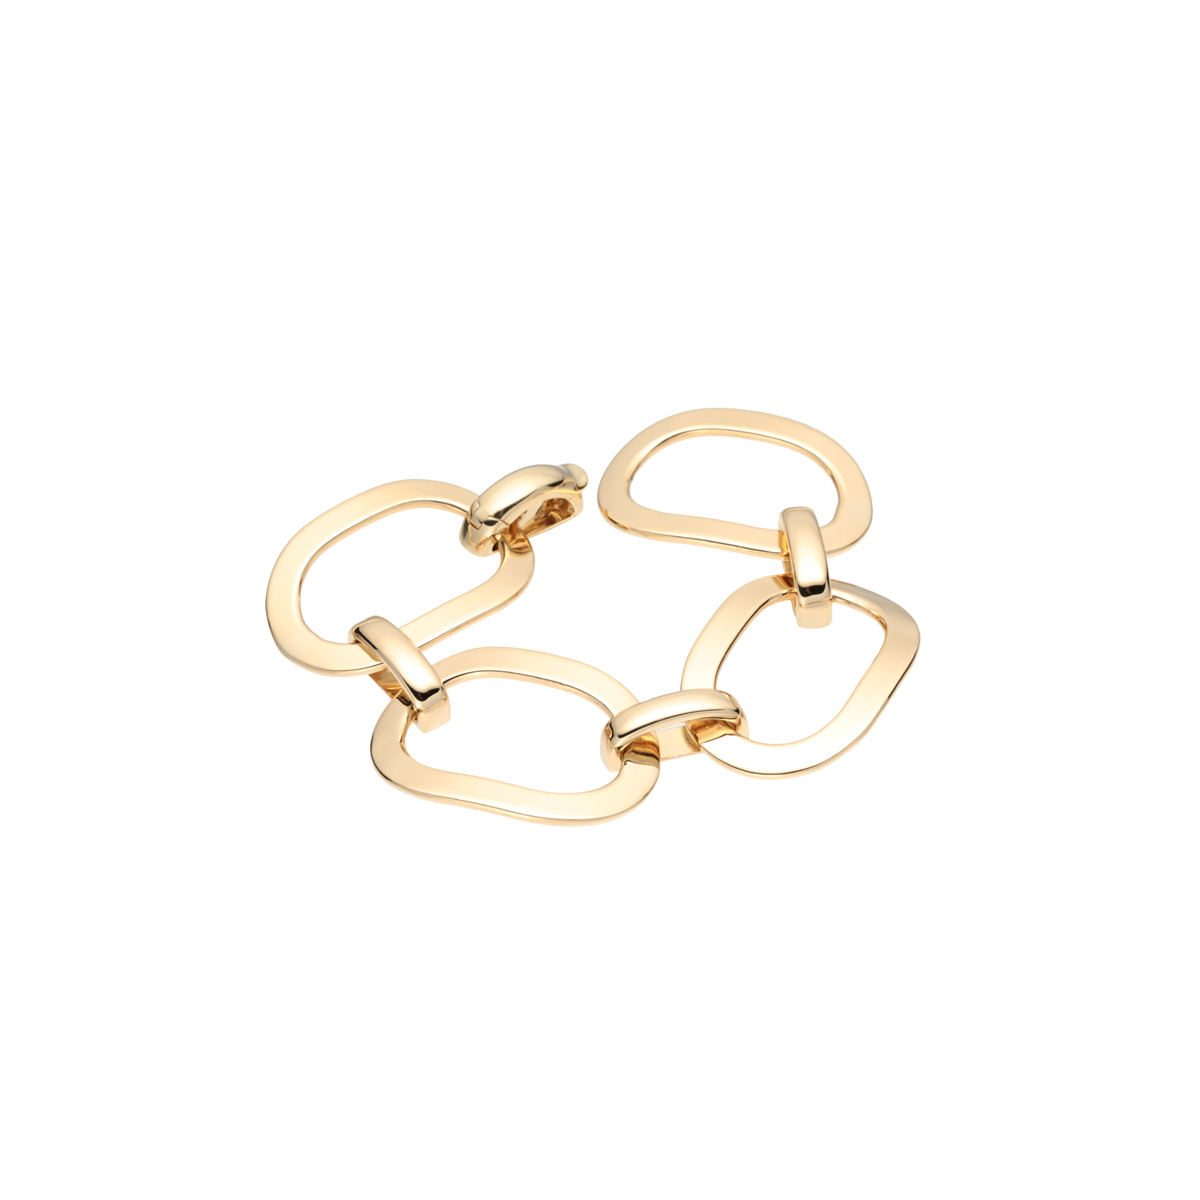 Flat Yellow Gold Link Chain Bracelet